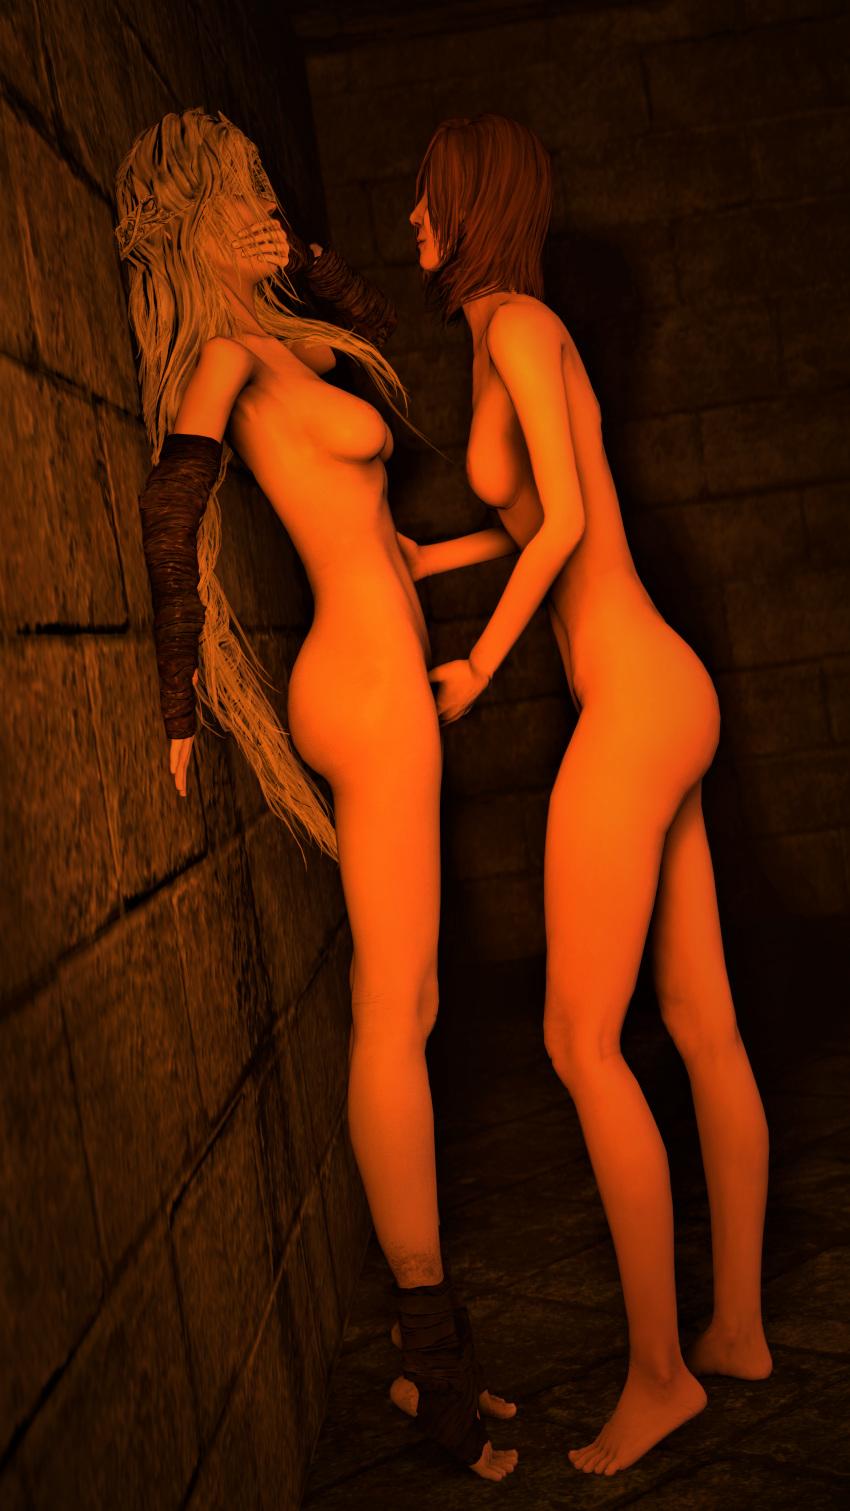 armor souls dark 2 viewer Miss kobayashi's dragon maid tohru nude